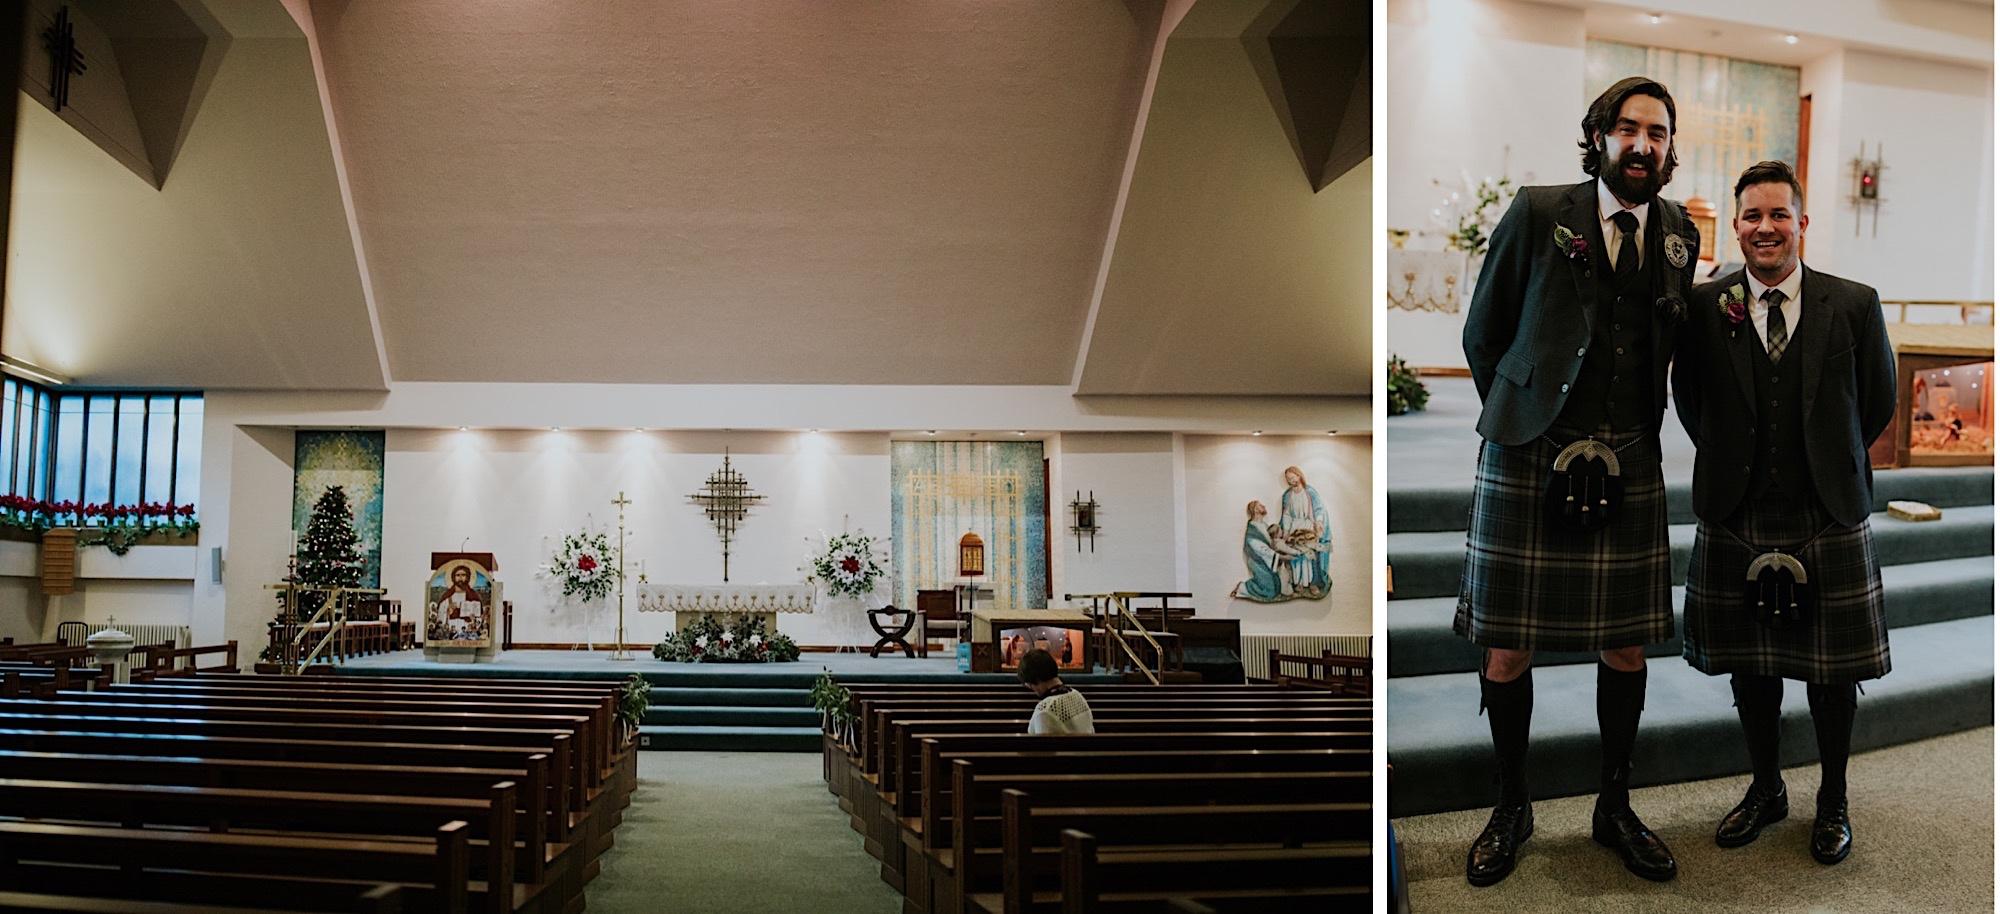 St Andrew catholic church glasgow wedding ceremony